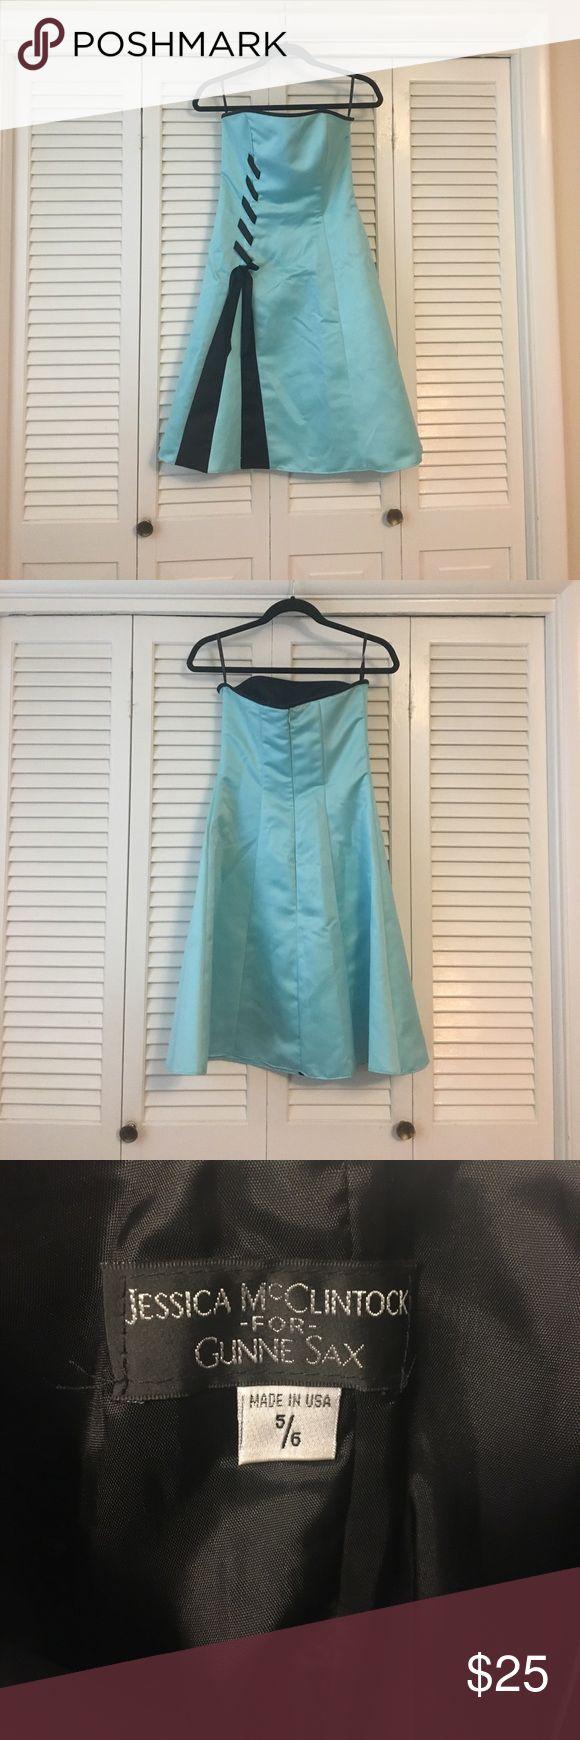 Jessica McClintock Size 5/6 Juniors Formal Dress Jessica McClintock formal light blue/green dress size 5/6 Jessica McClintock Dresses